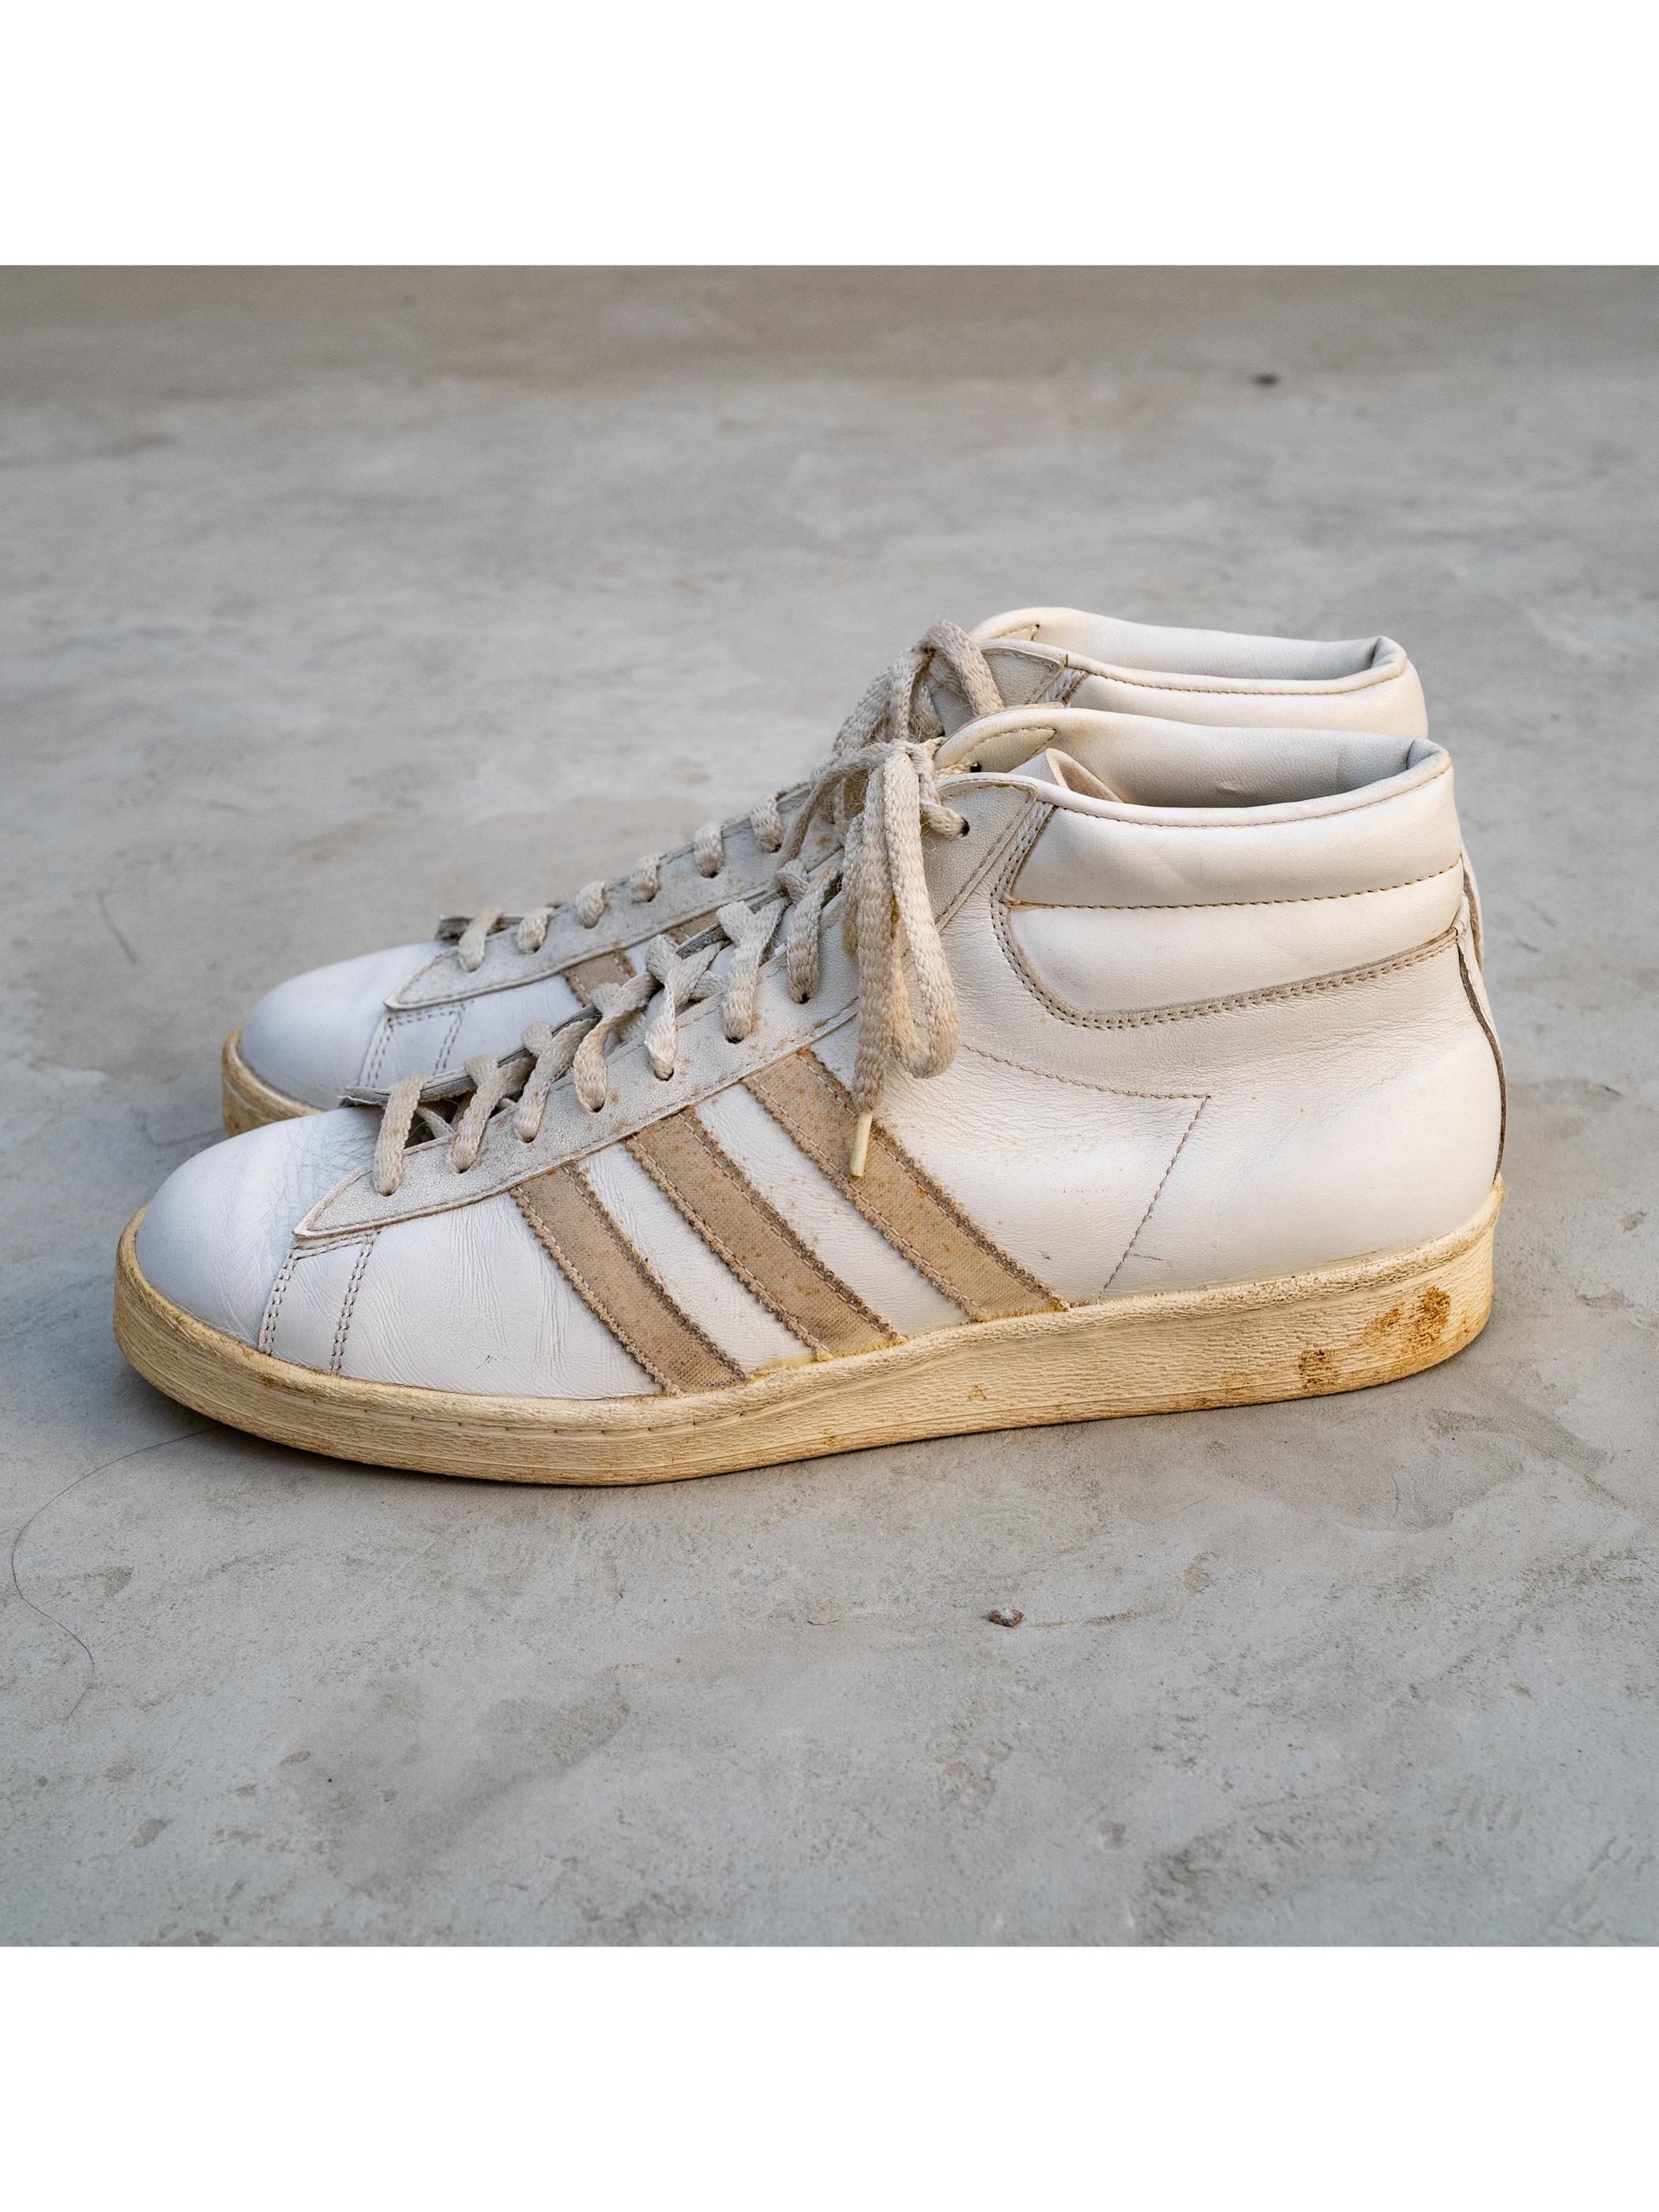 70's adidas